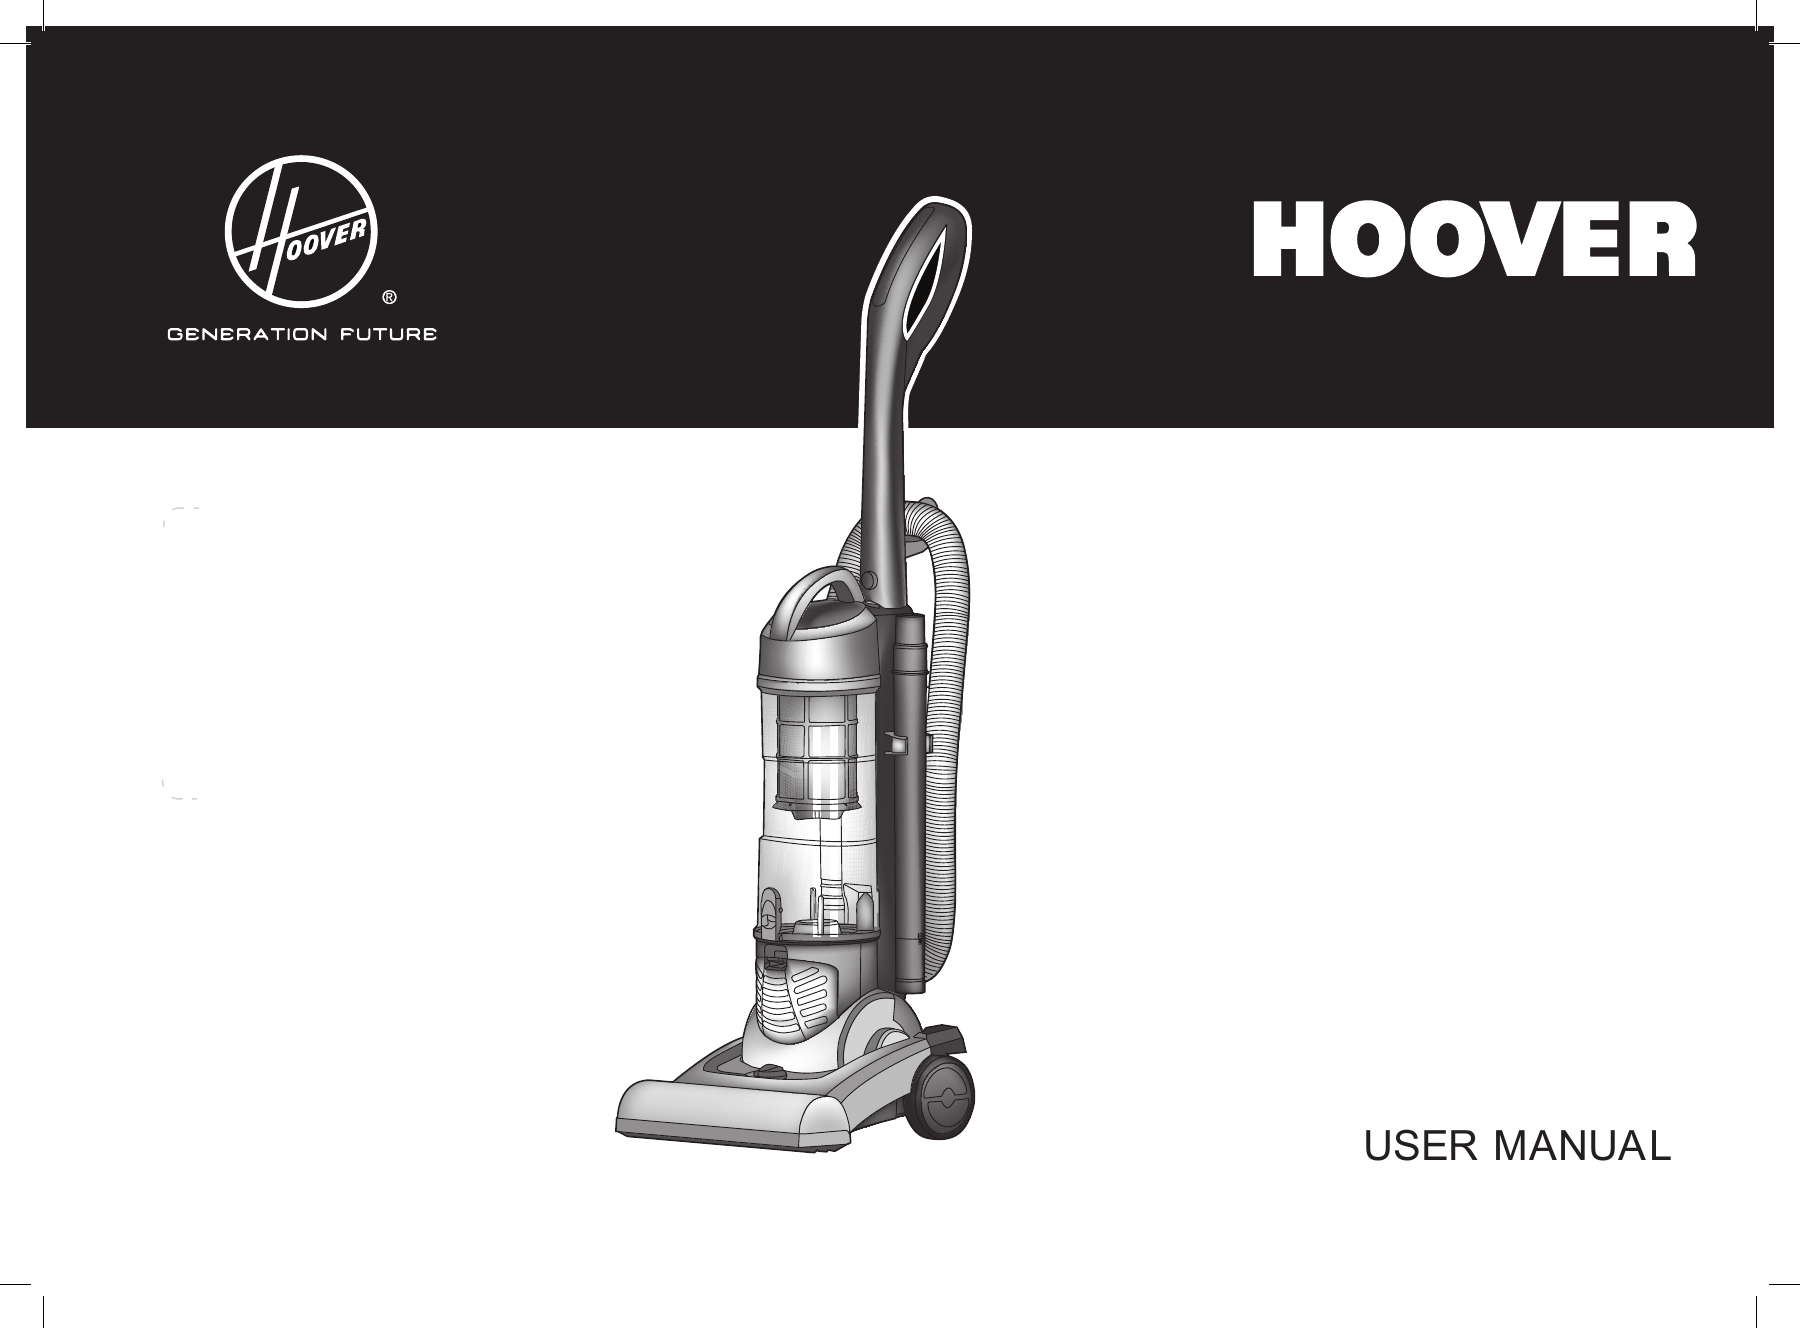 hoover smart bagless upright vacuum cleaner th71sm01 instruction rh usermanual wiki Hoover Elite Vacuum Manual Hoover Elite 350 Vacuum Manual